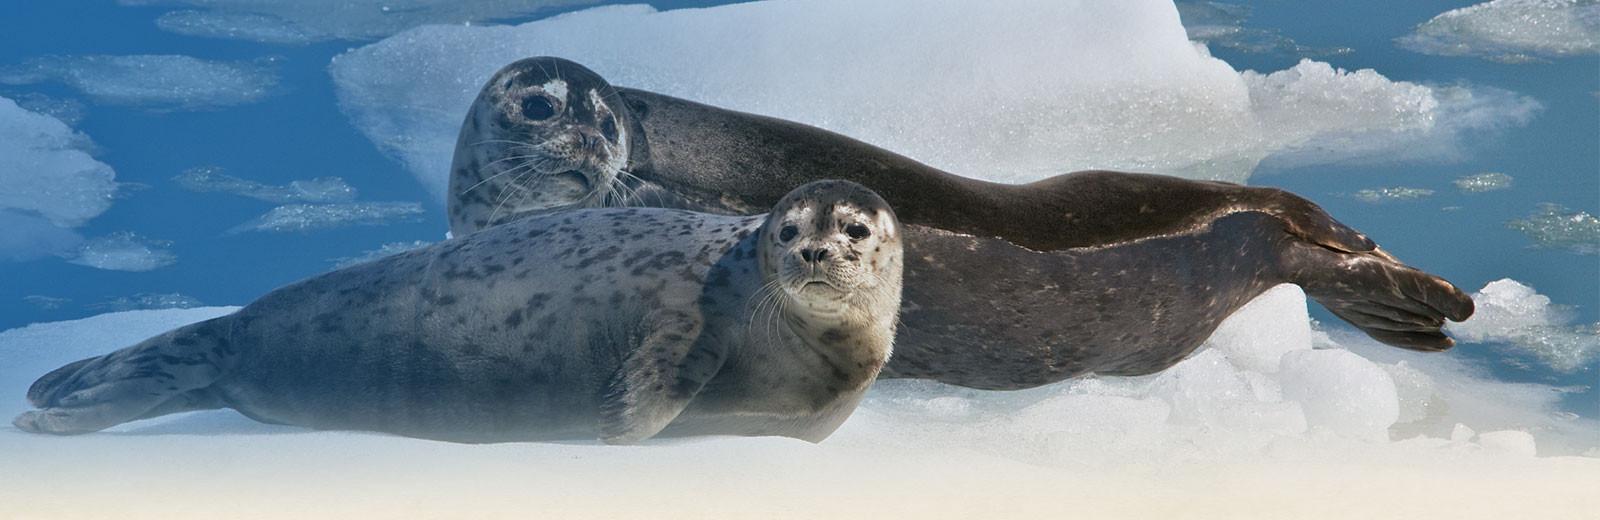 Stan Stephens Cruises - seals